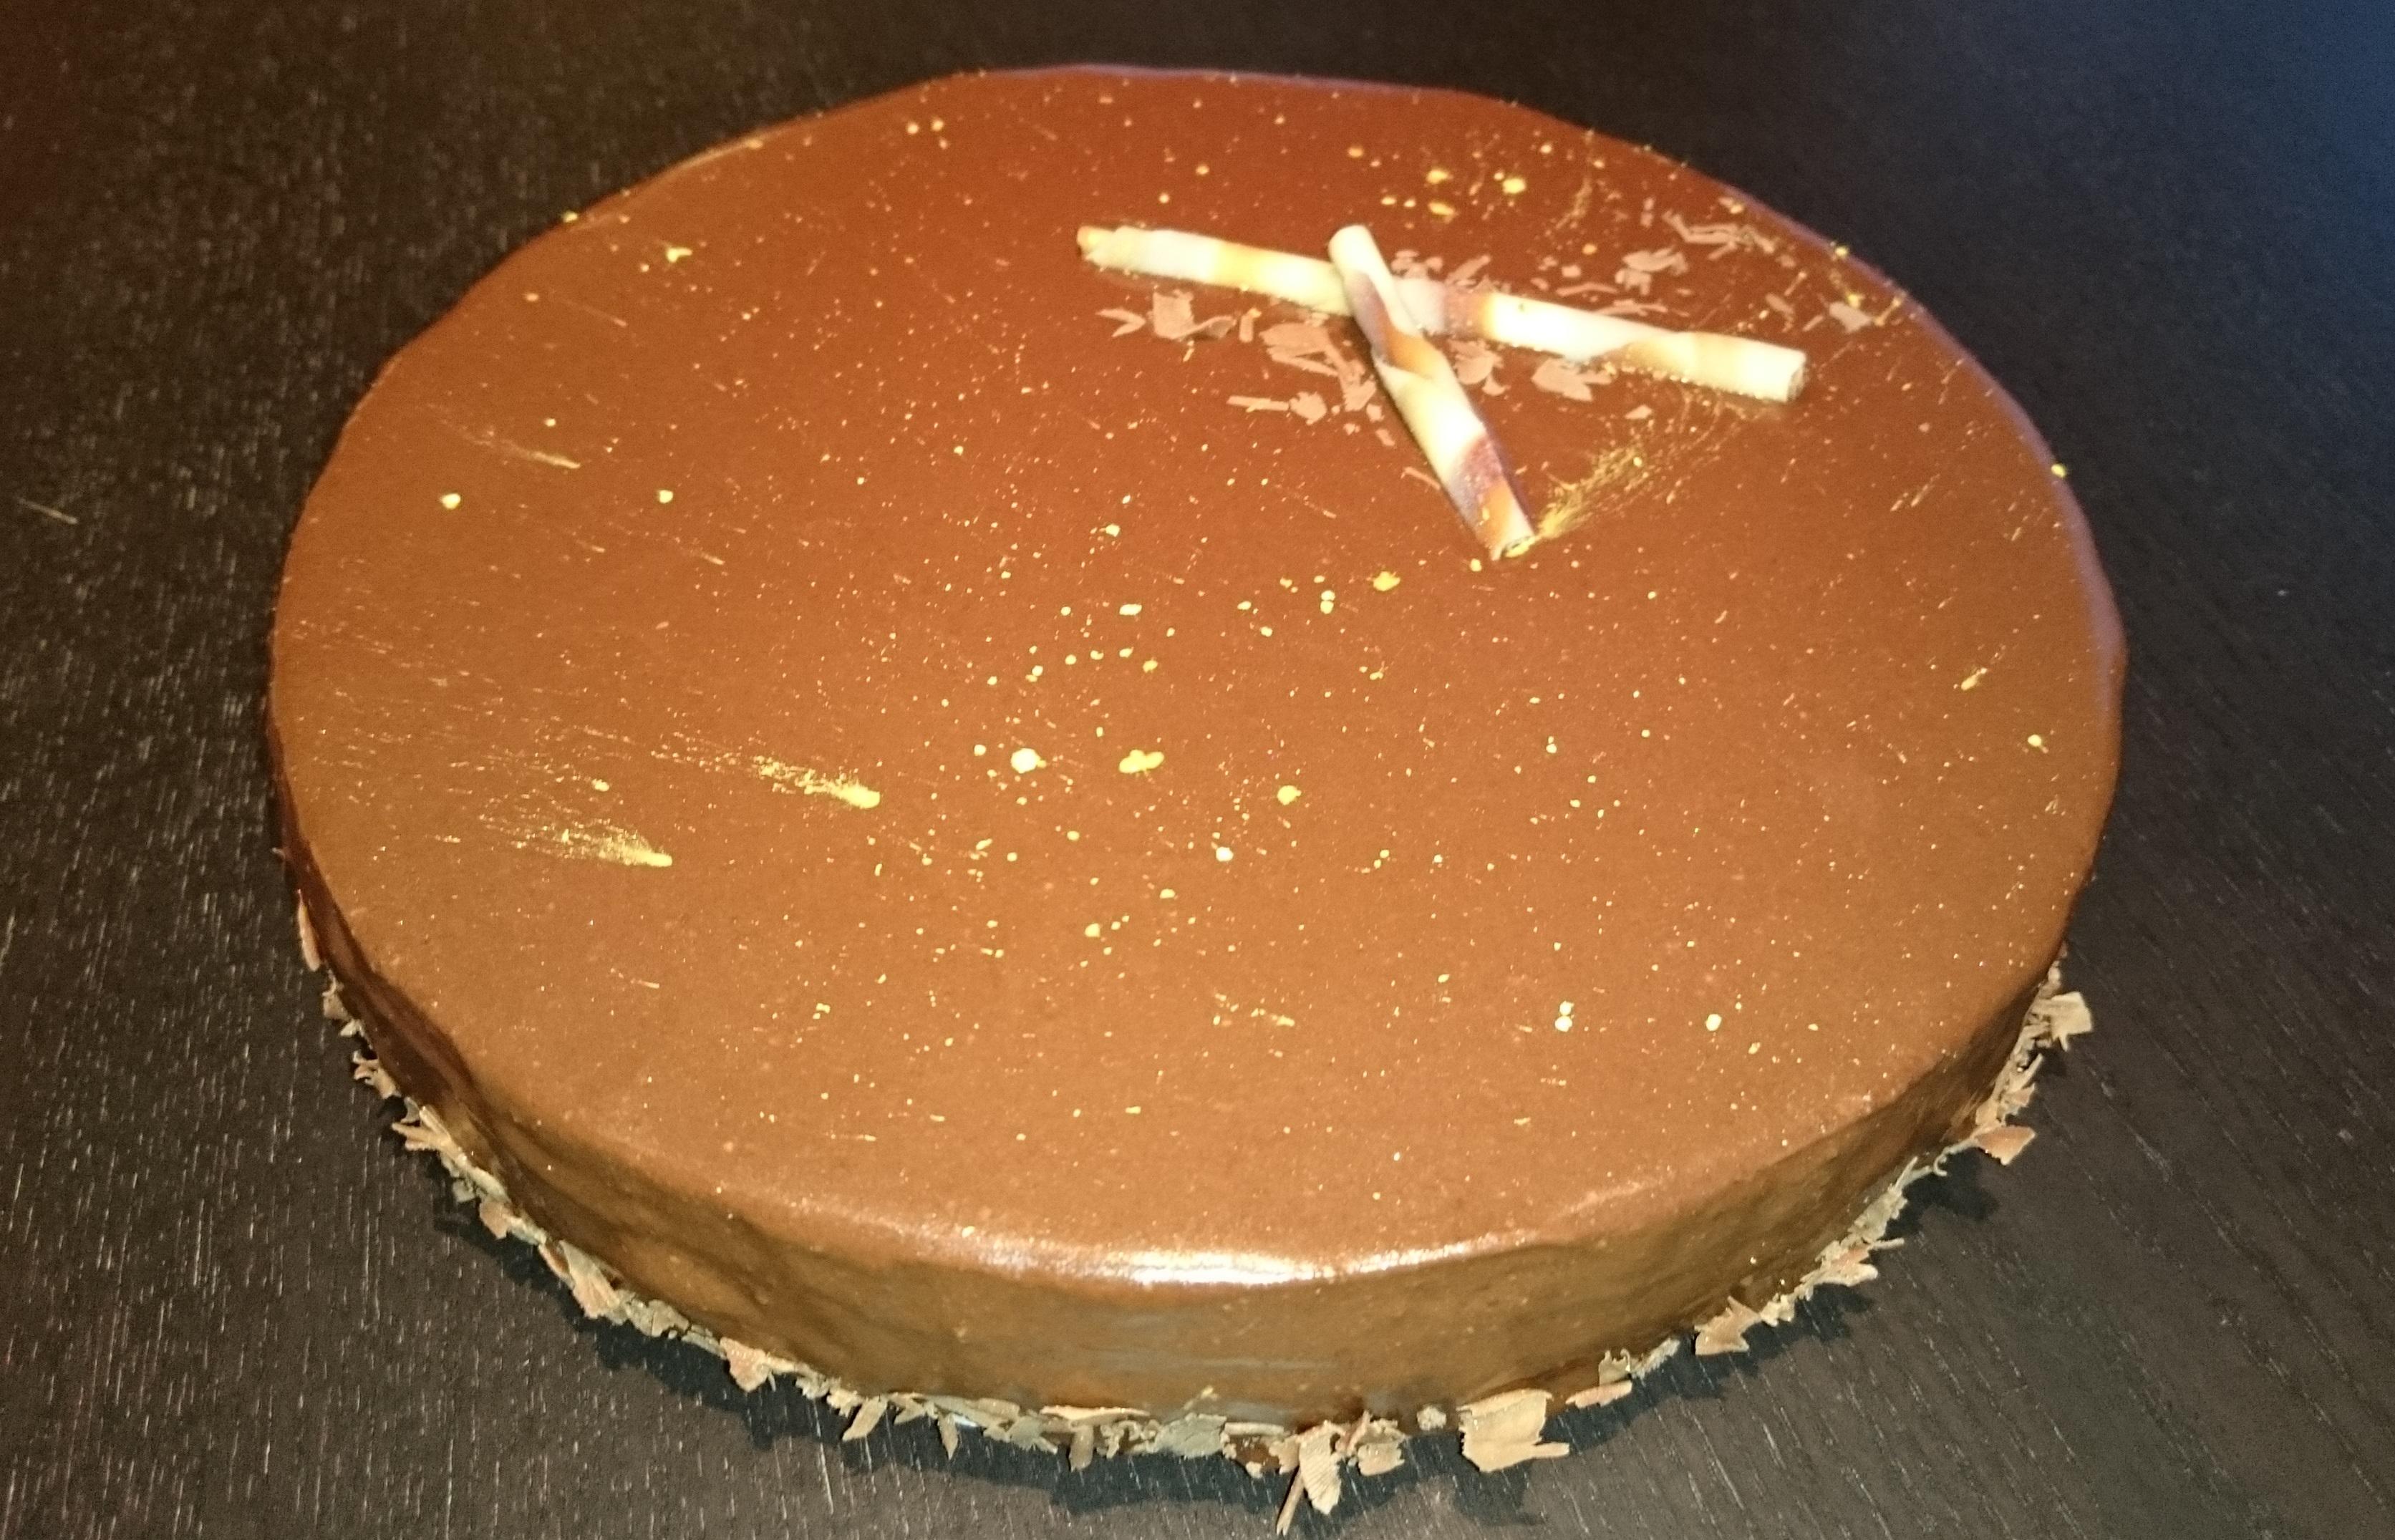 Gla age au chocolat a turbine en cuisine for Glacage miroir caramel